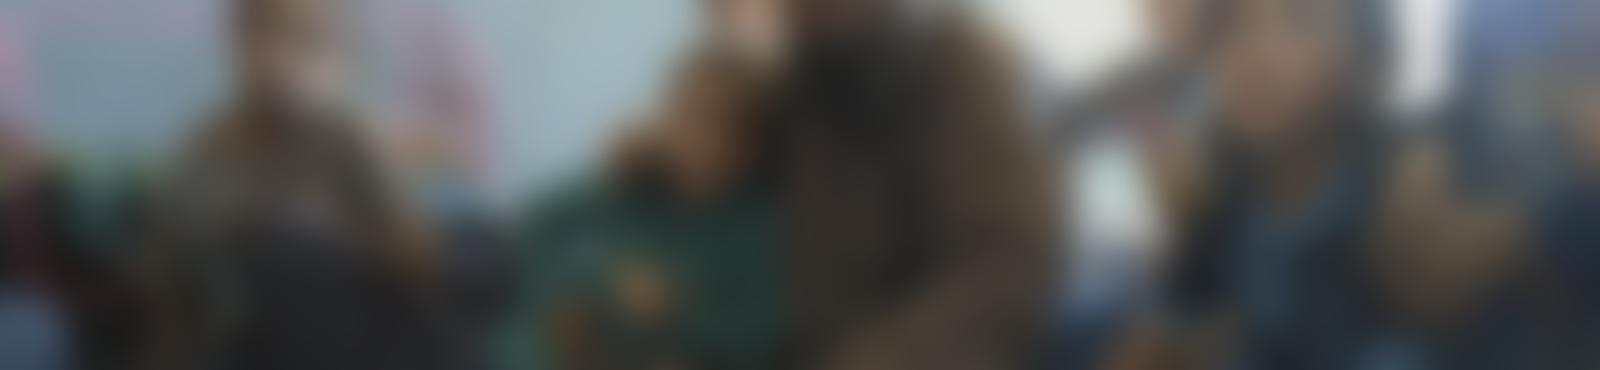 Blurred 1eb68e07 ea21 40b0 bed3 215825594ef1